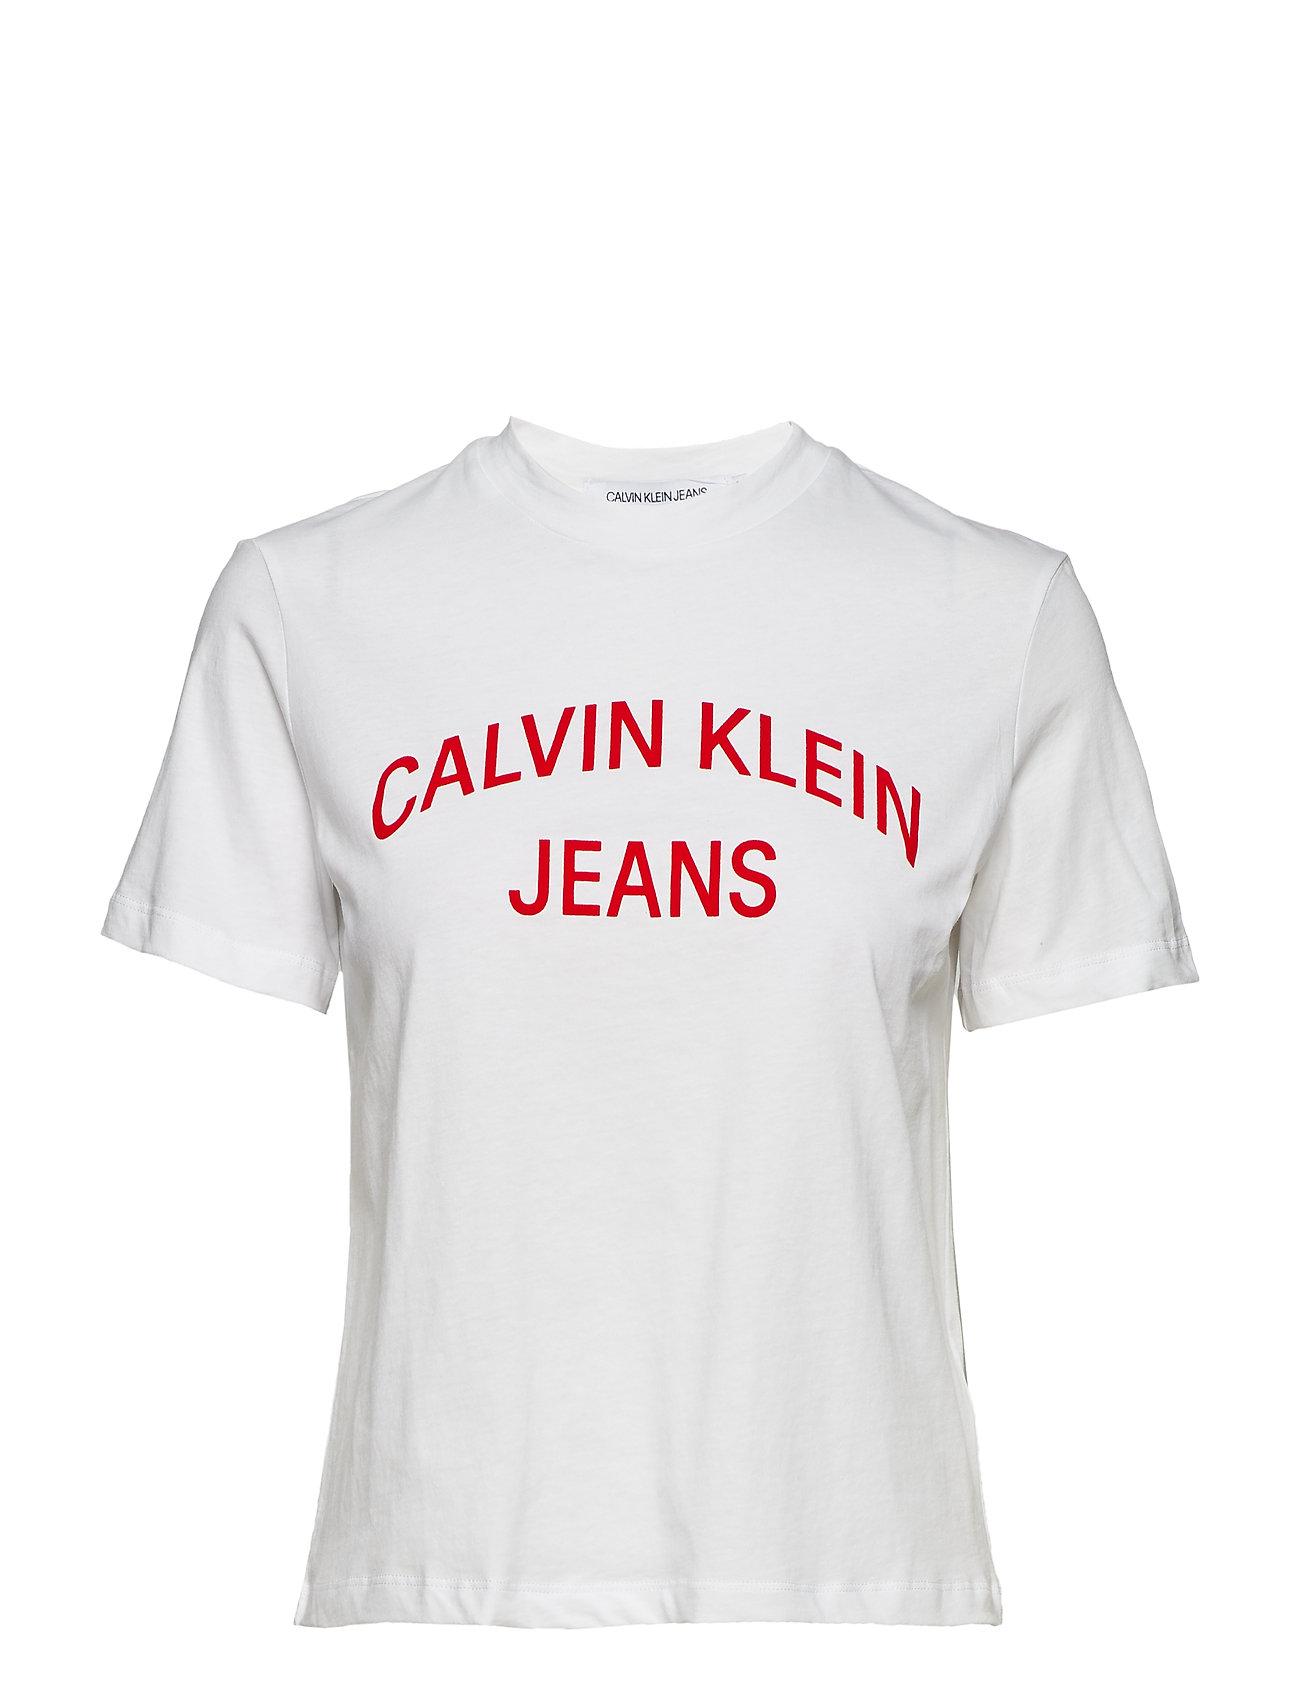 Calvin Klein Jeans INST. CURVED LOGO ST - BRIGHT WHITE